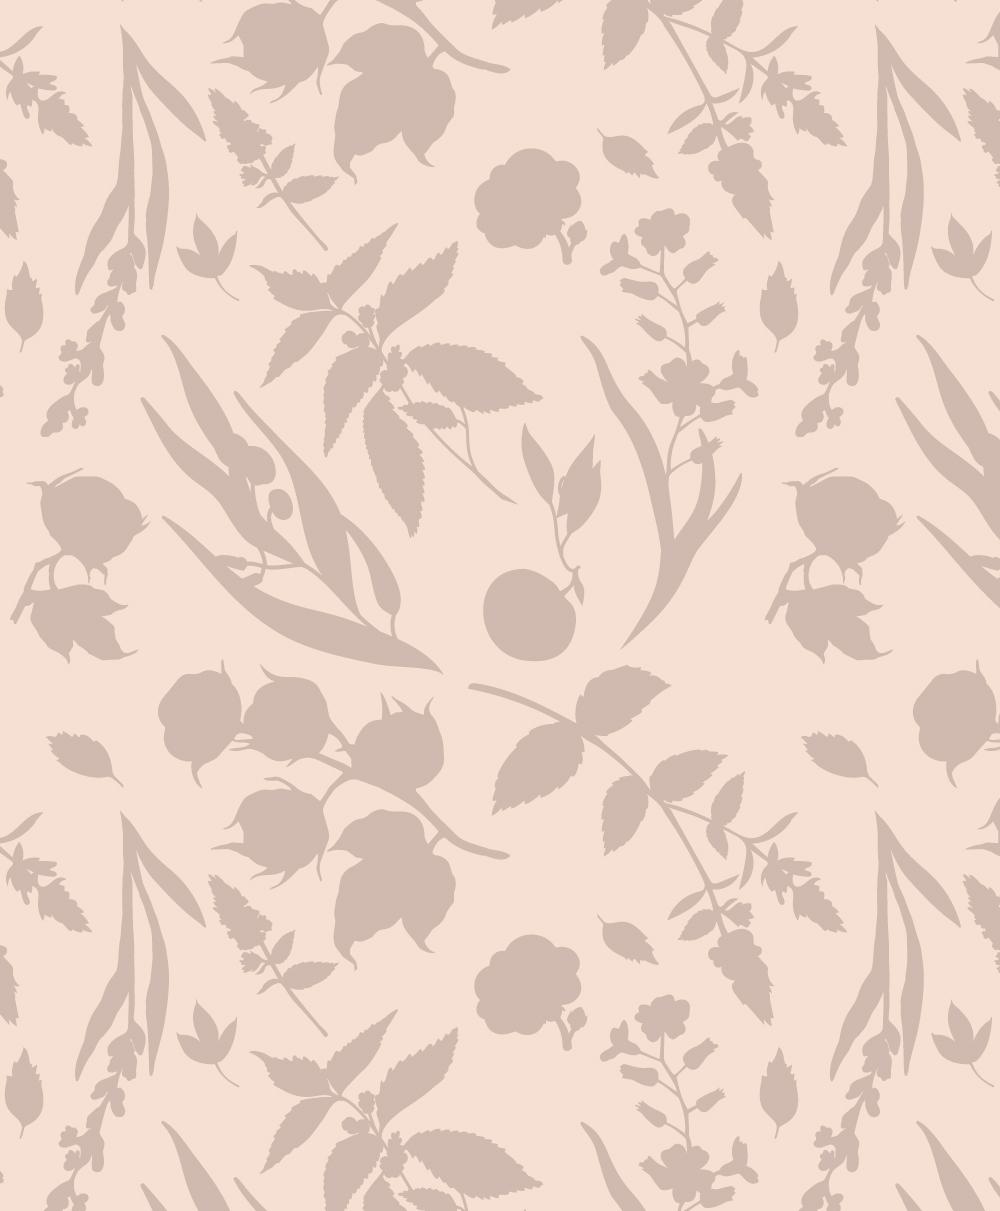 justbenice-BioMio-pattern-1.jpg